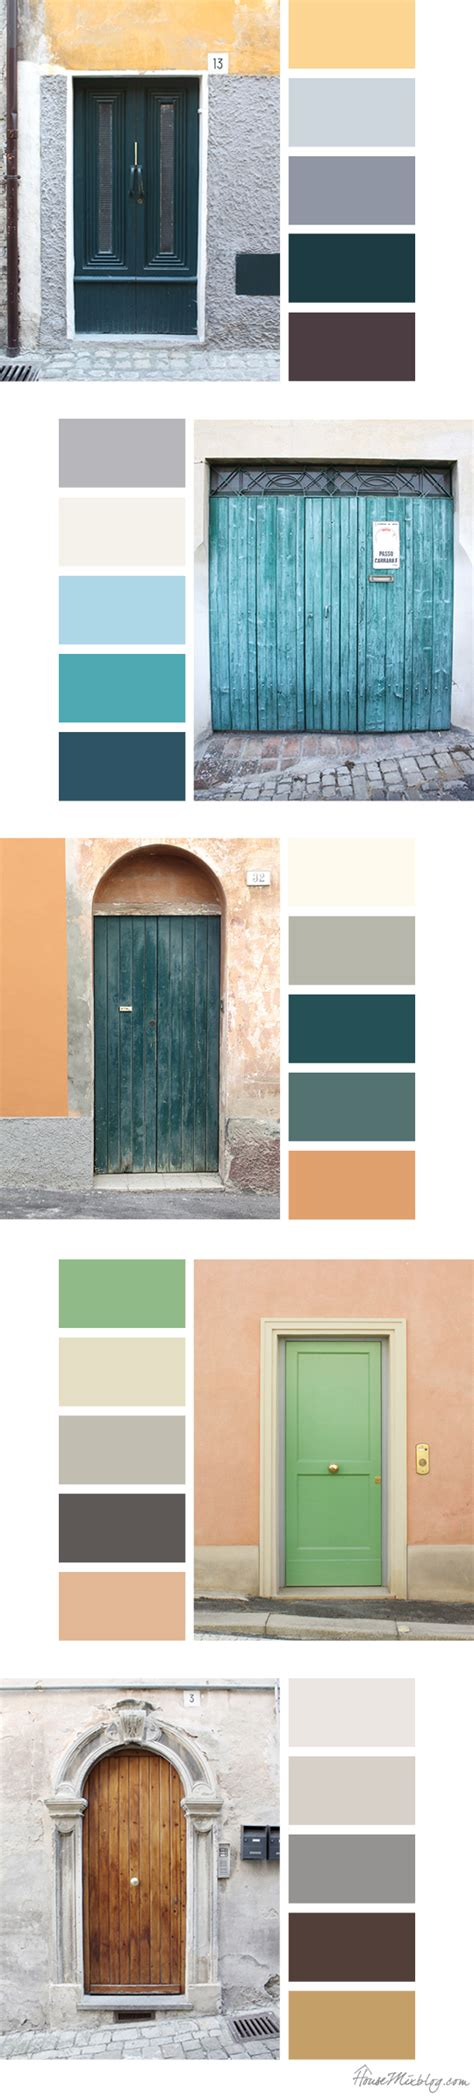 italian door color palette inspiration house mix